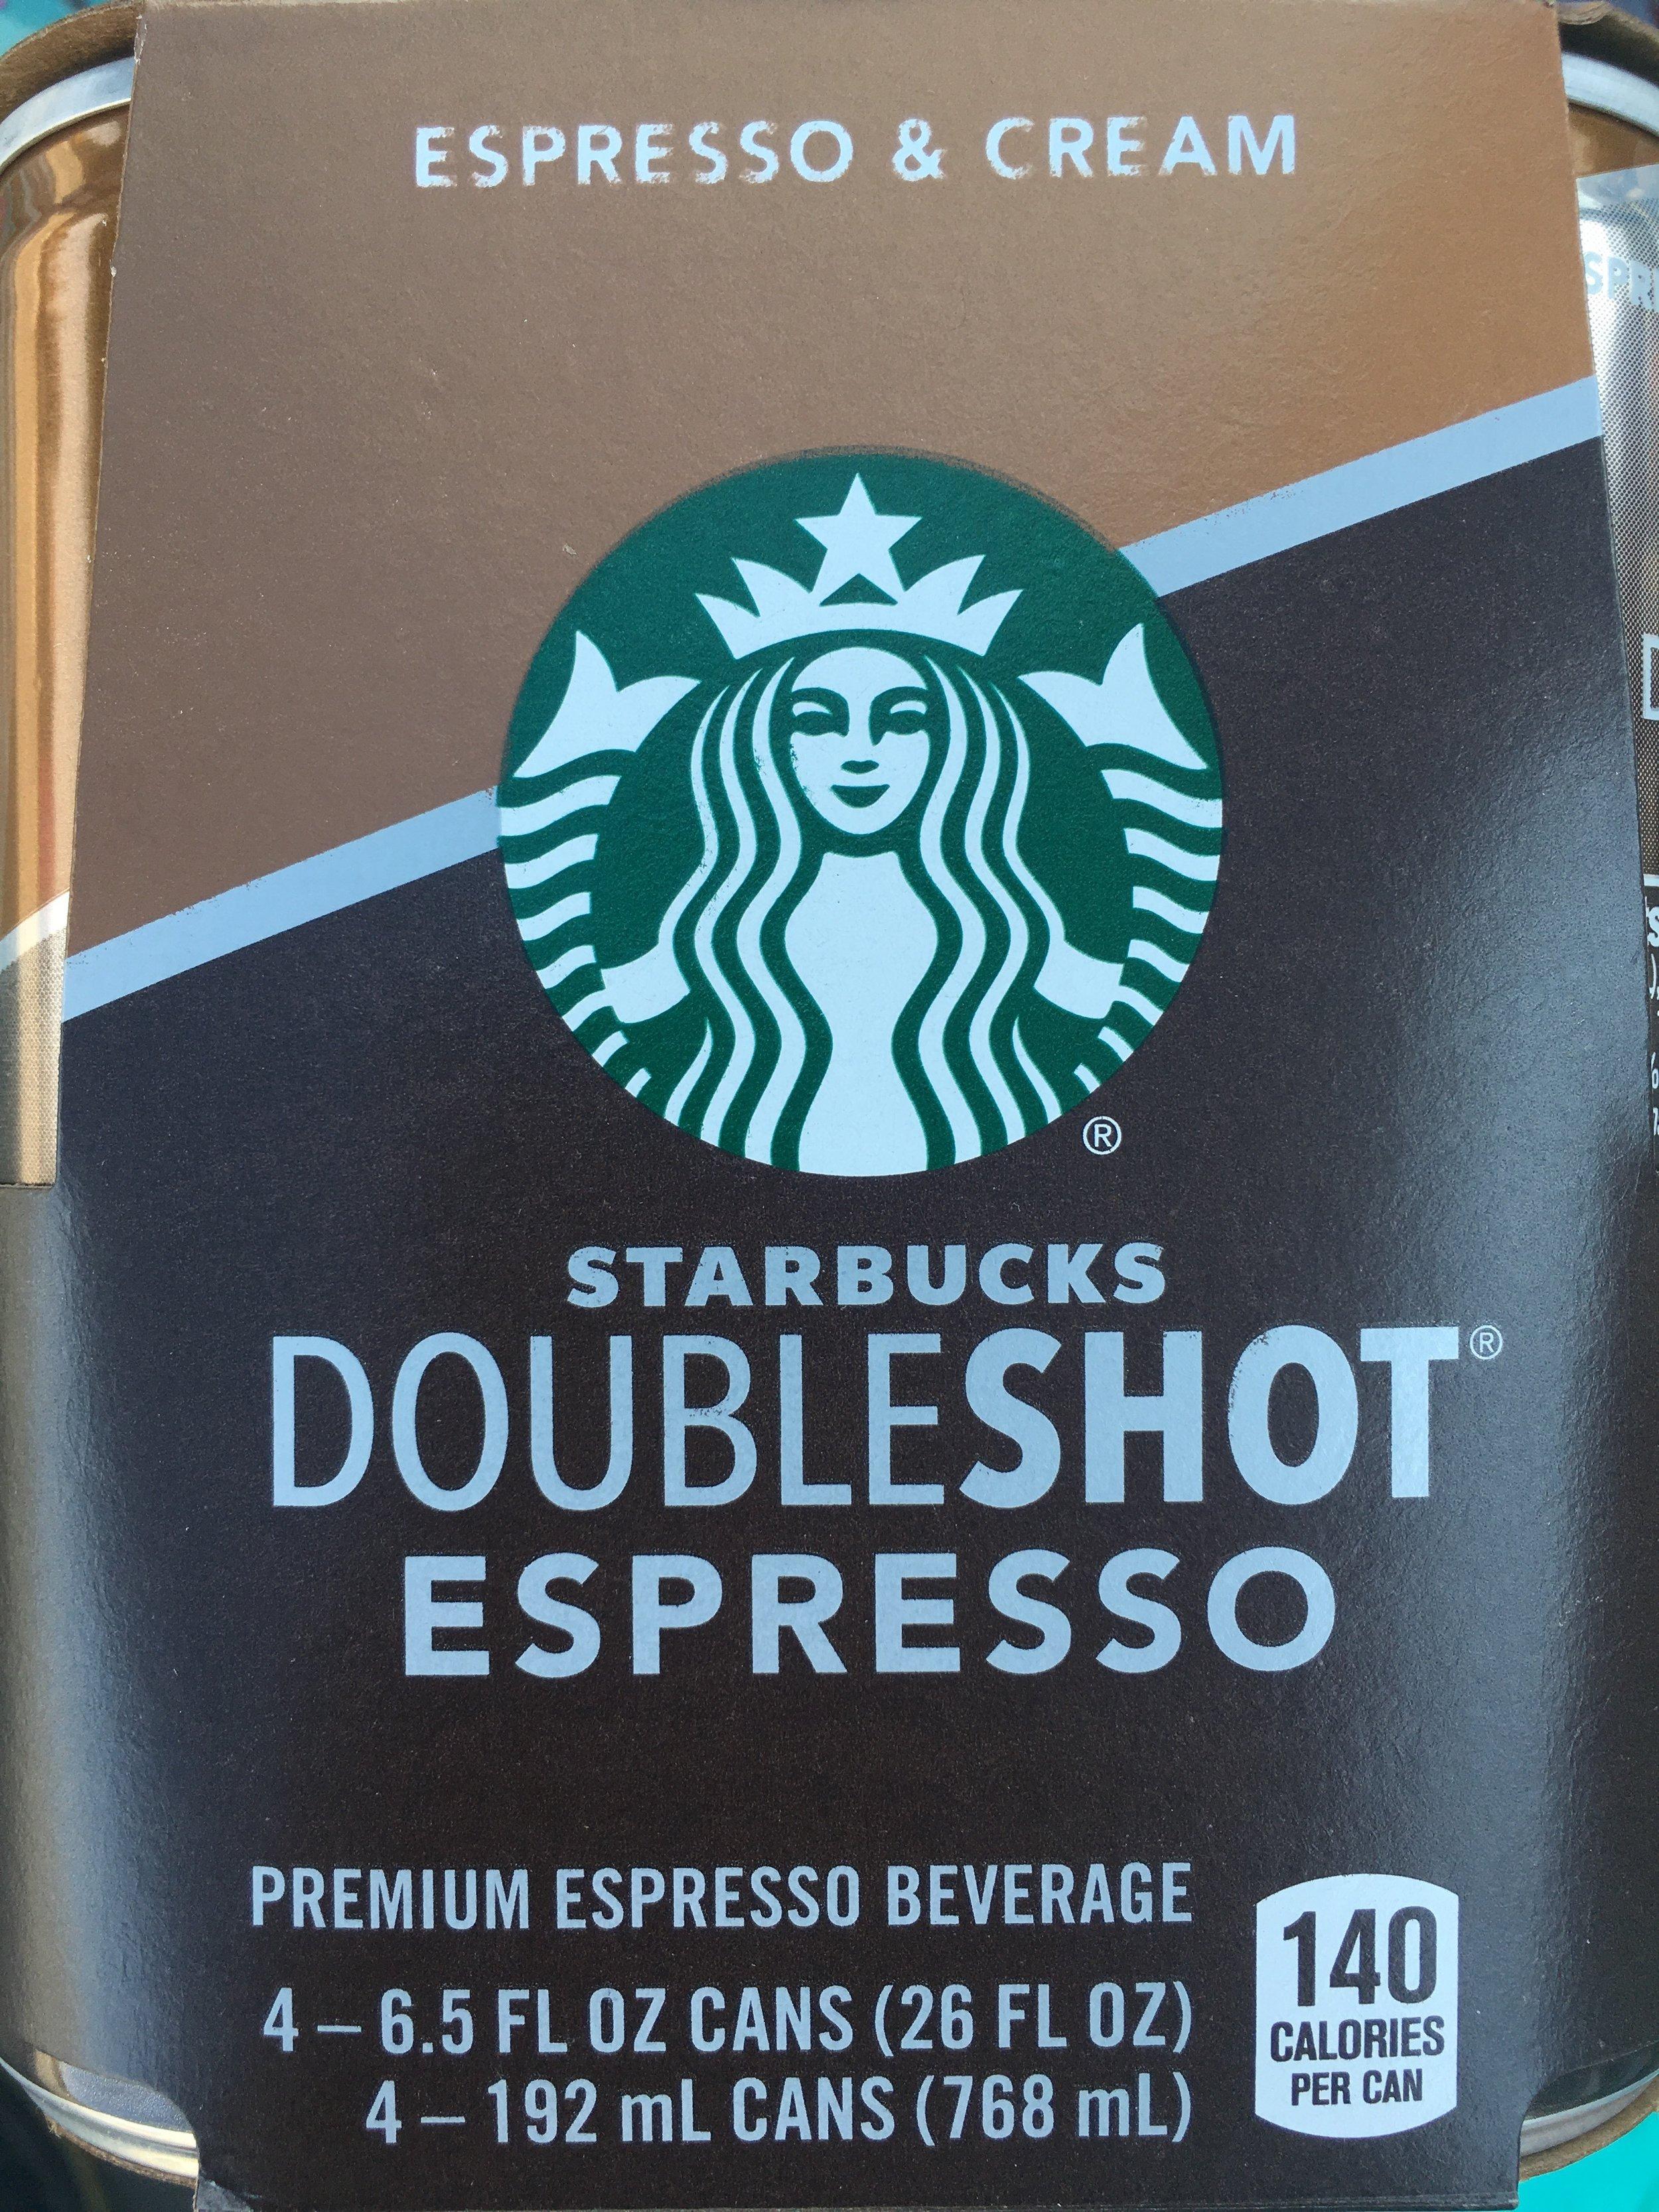 Starbucks - Doubleshot - Espresso & Cream